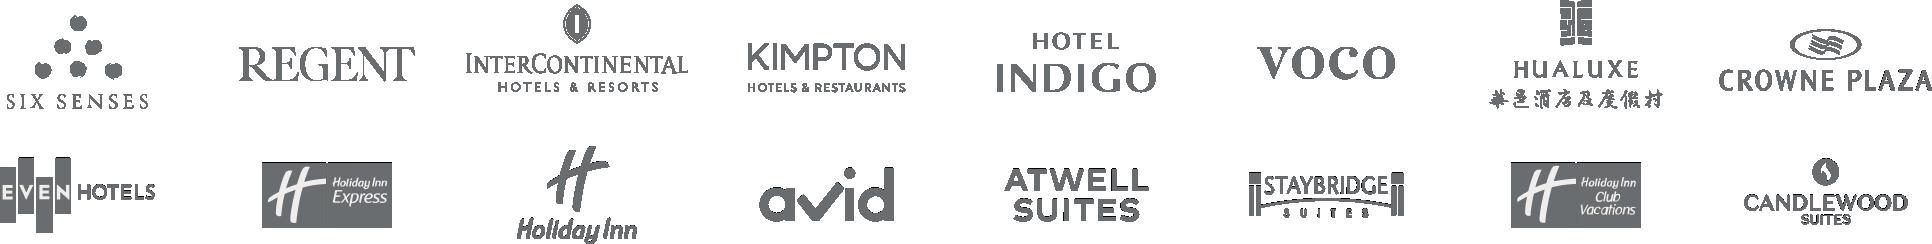 Welcome to IHG Hotels & Resorts